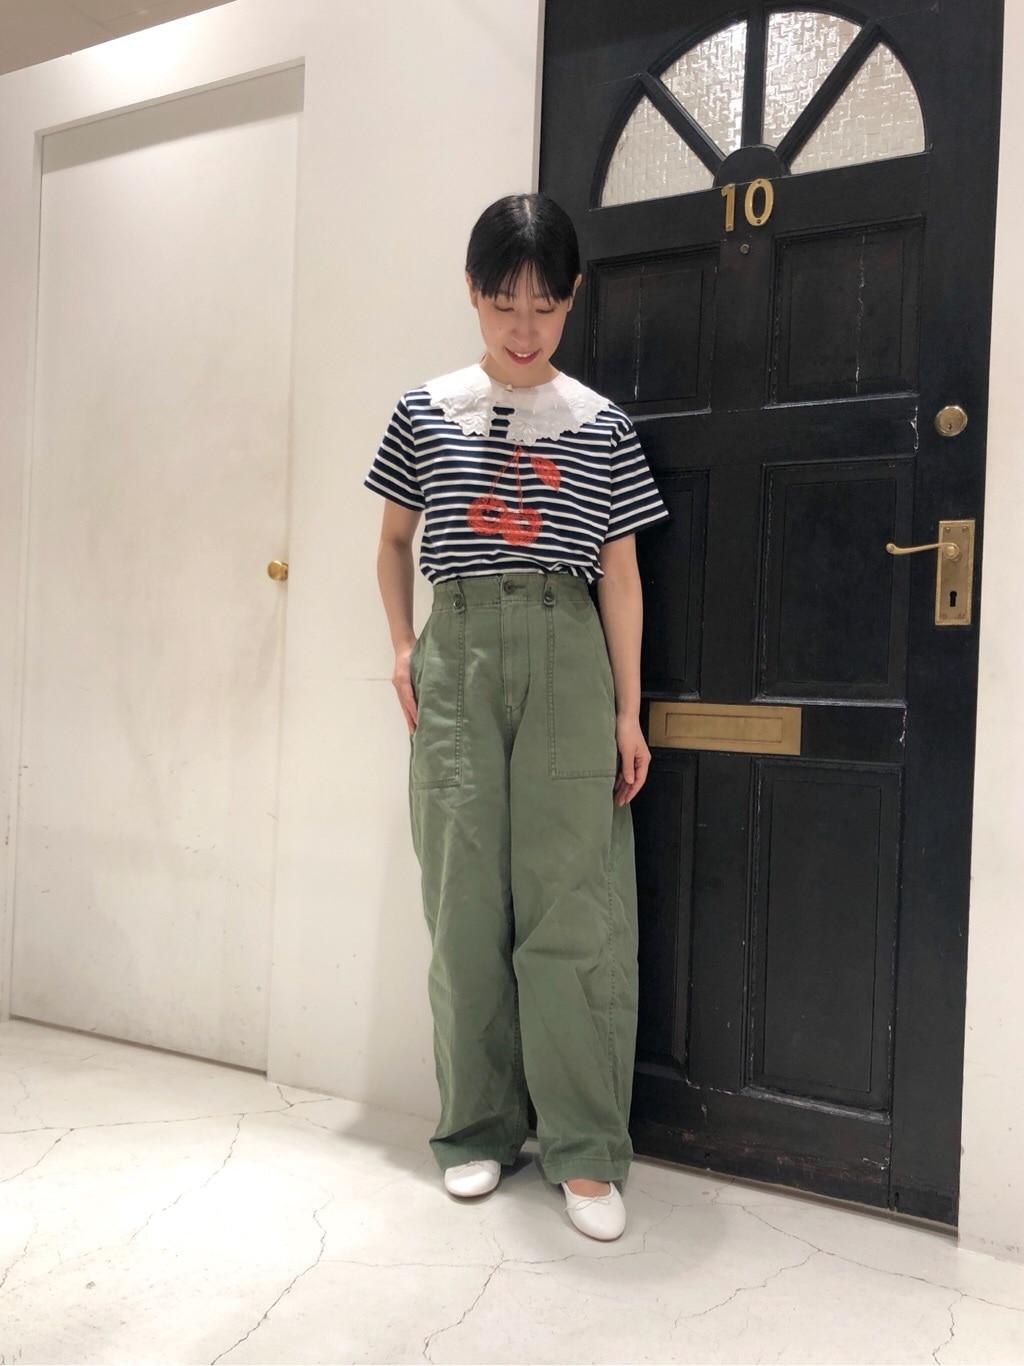 Dot and Stripes CHILD WOMAN ルクアイーレ 身長:151cm 2021.06.05